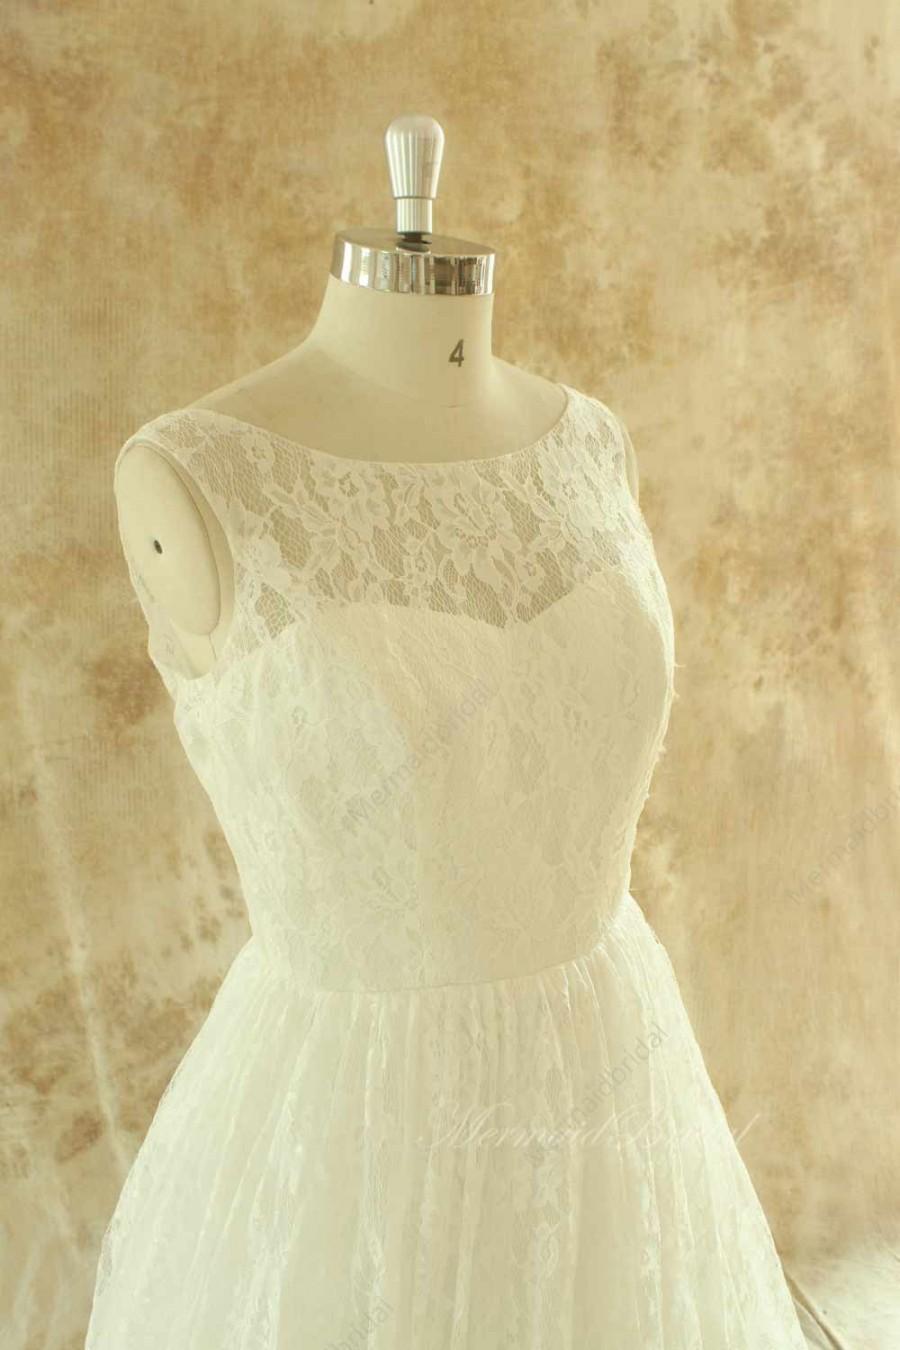 Wedding - Ivory A line lace wedding dress with illusion neckline